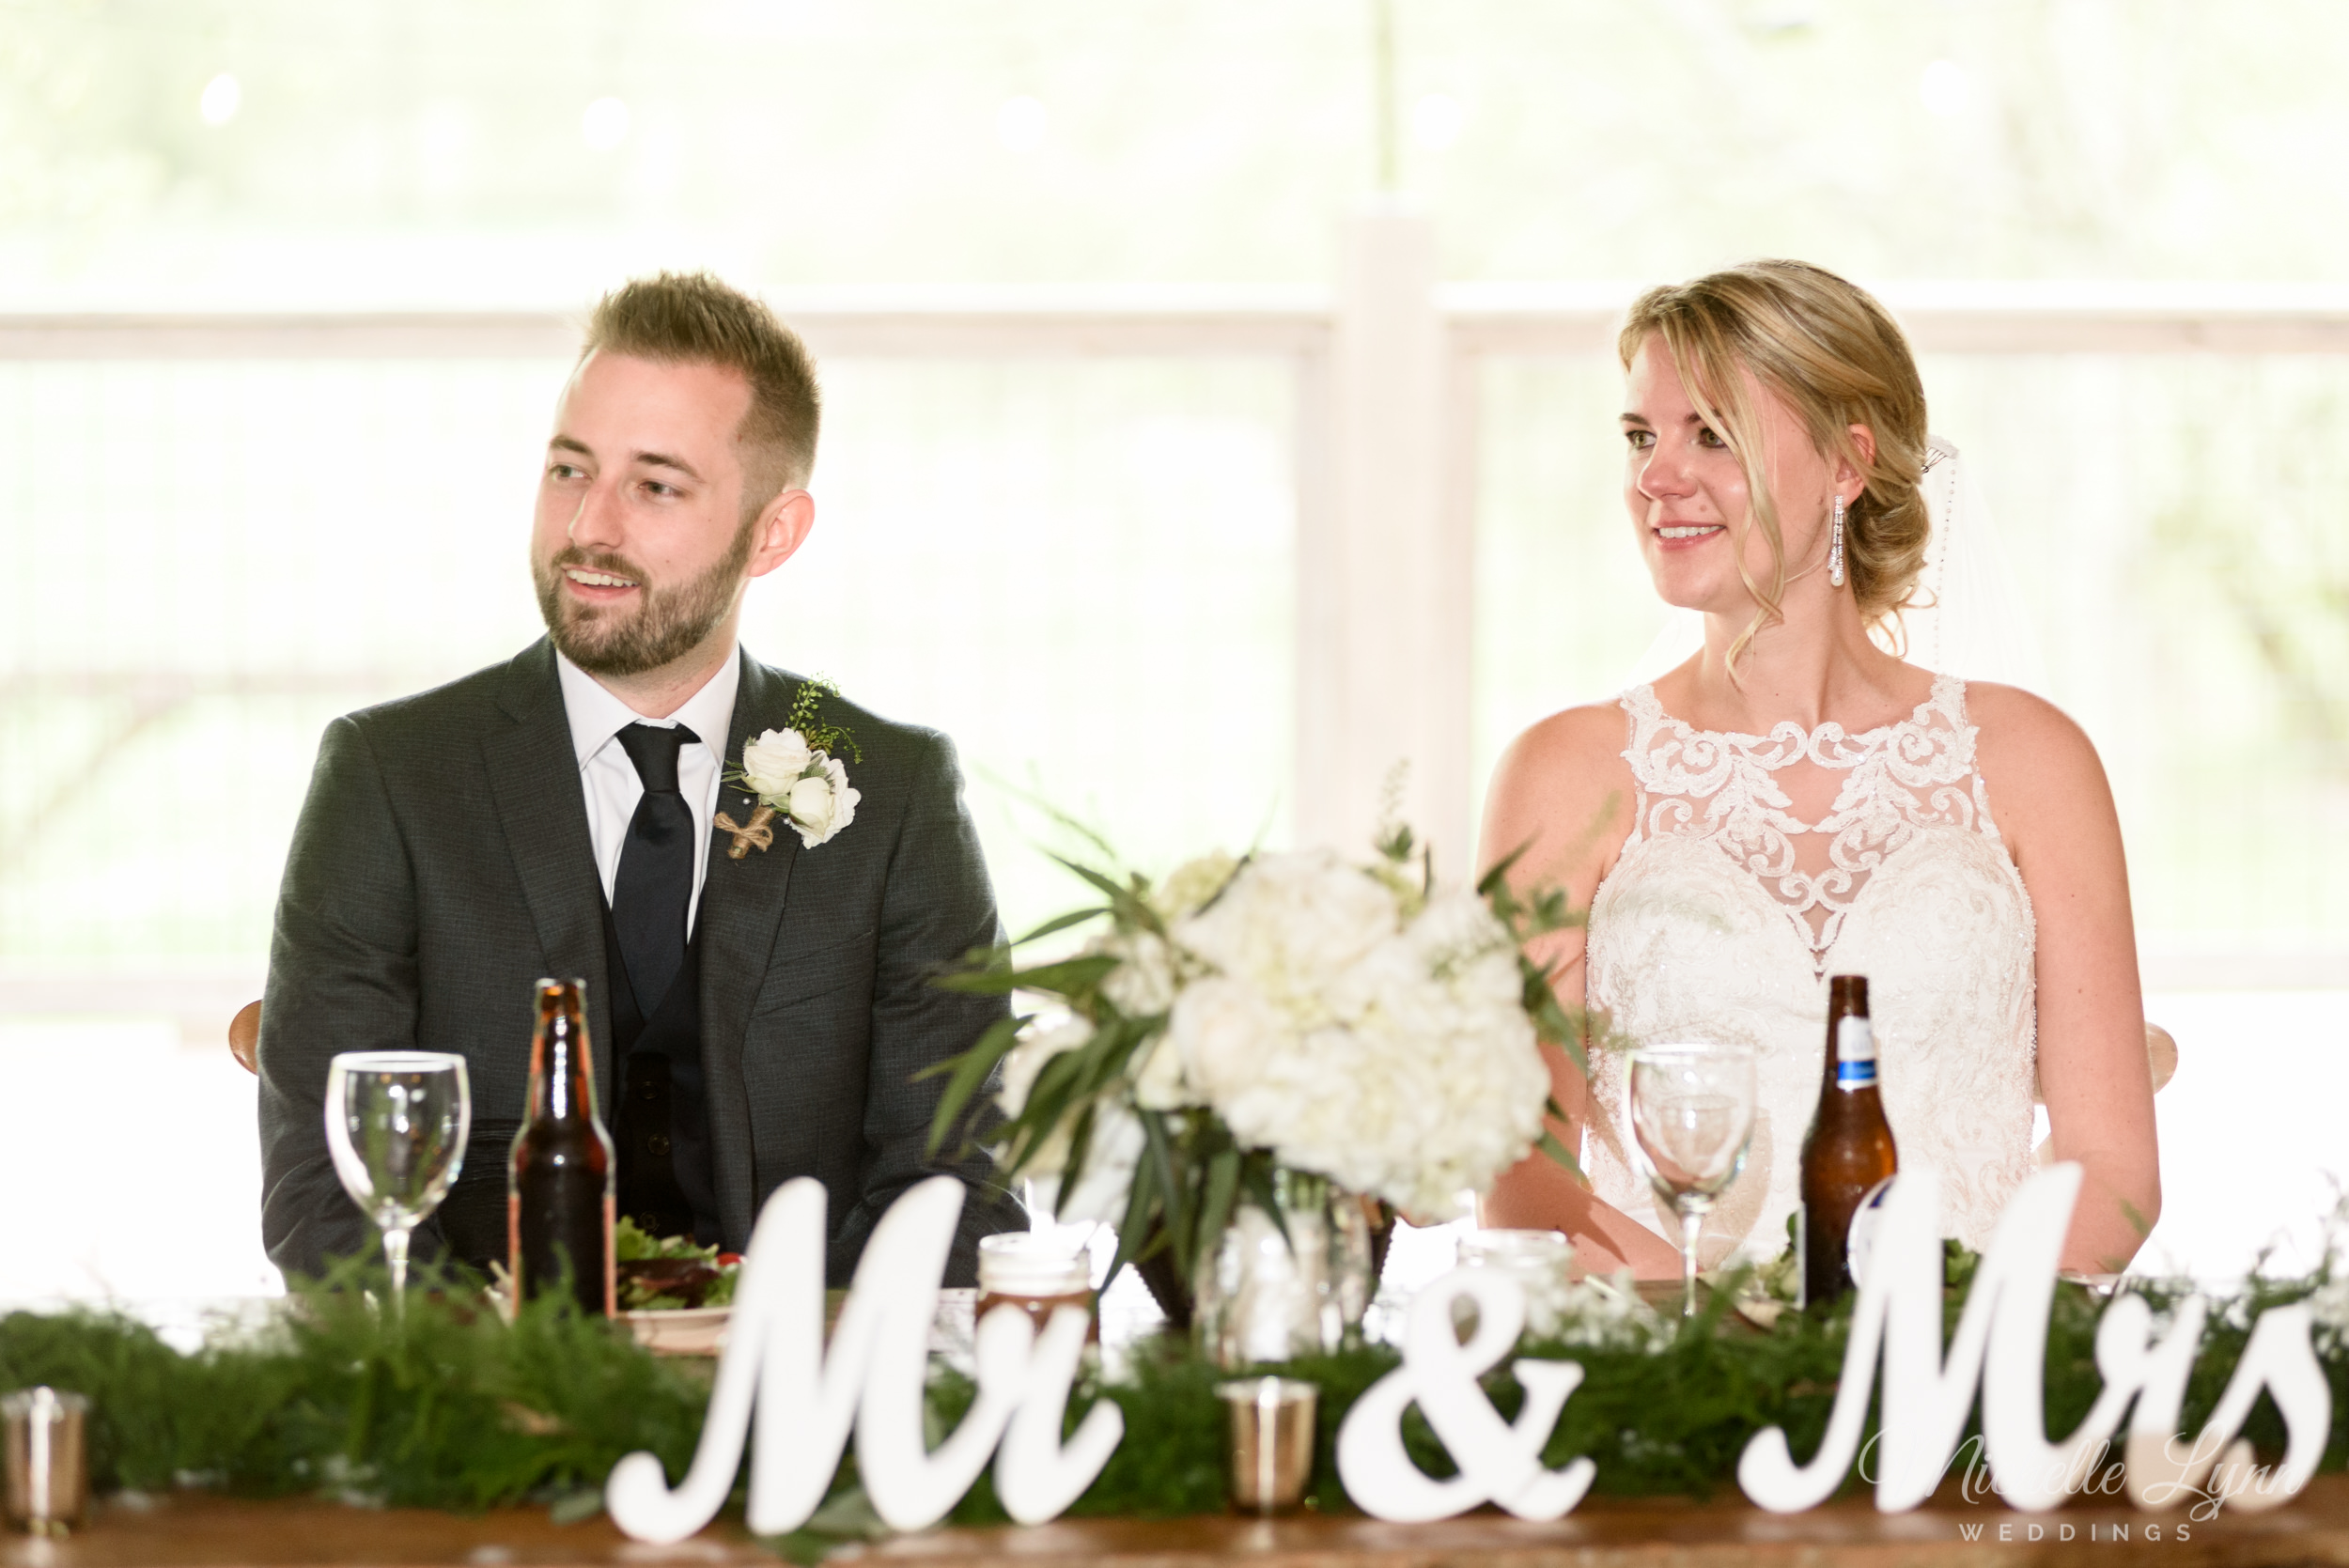 mlw-the-farm-bakery-and-events-wedding-photos-69.jpg